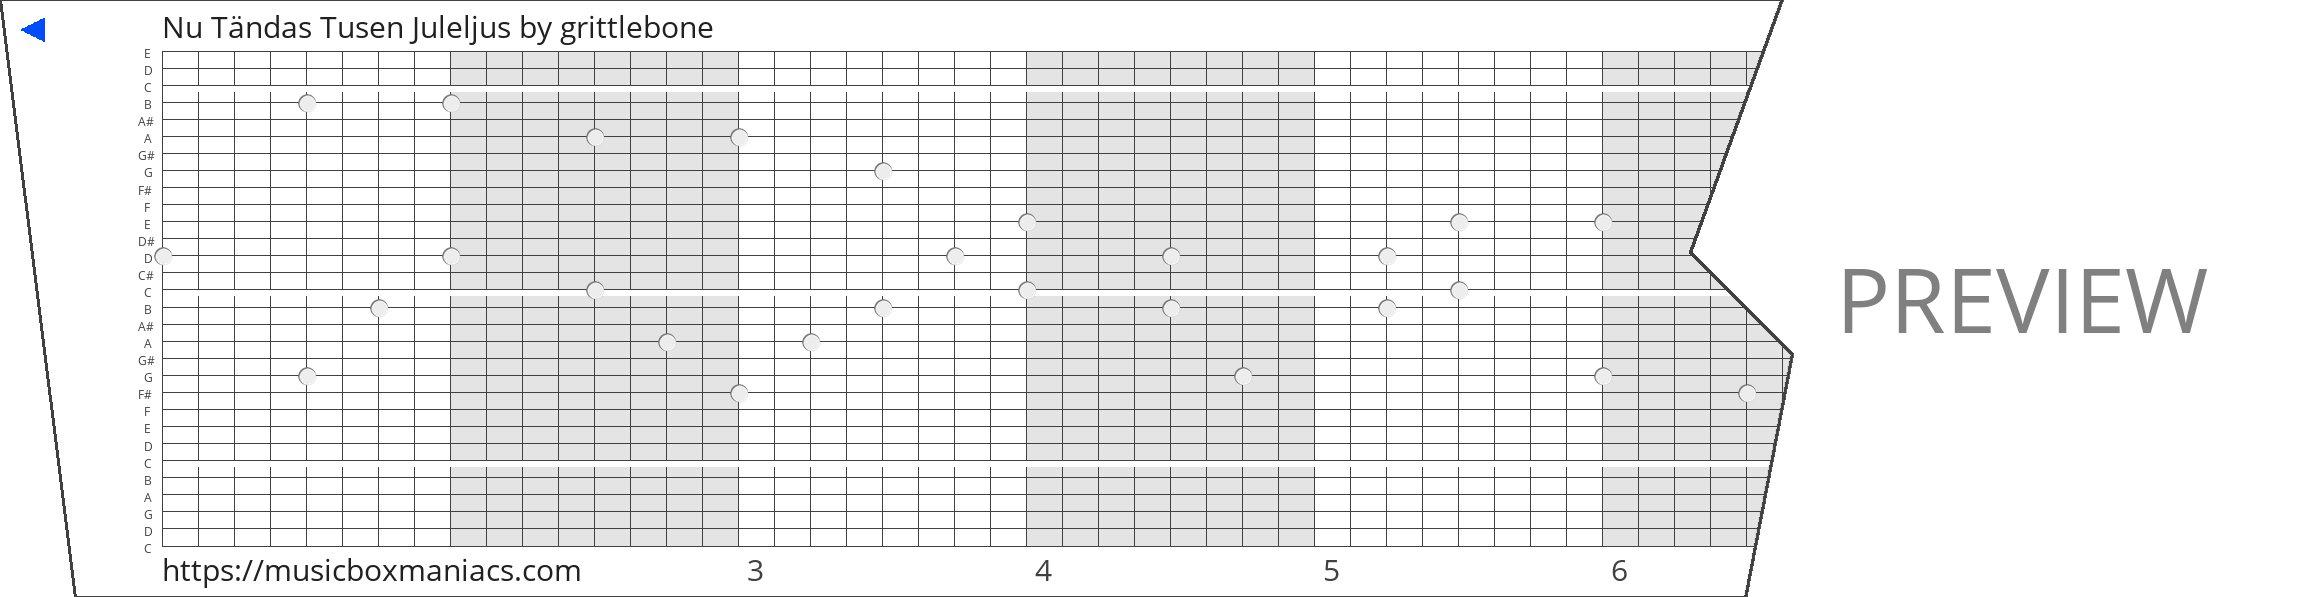 Nu Tändas Tusen Juleljus 30 note music box paper strip